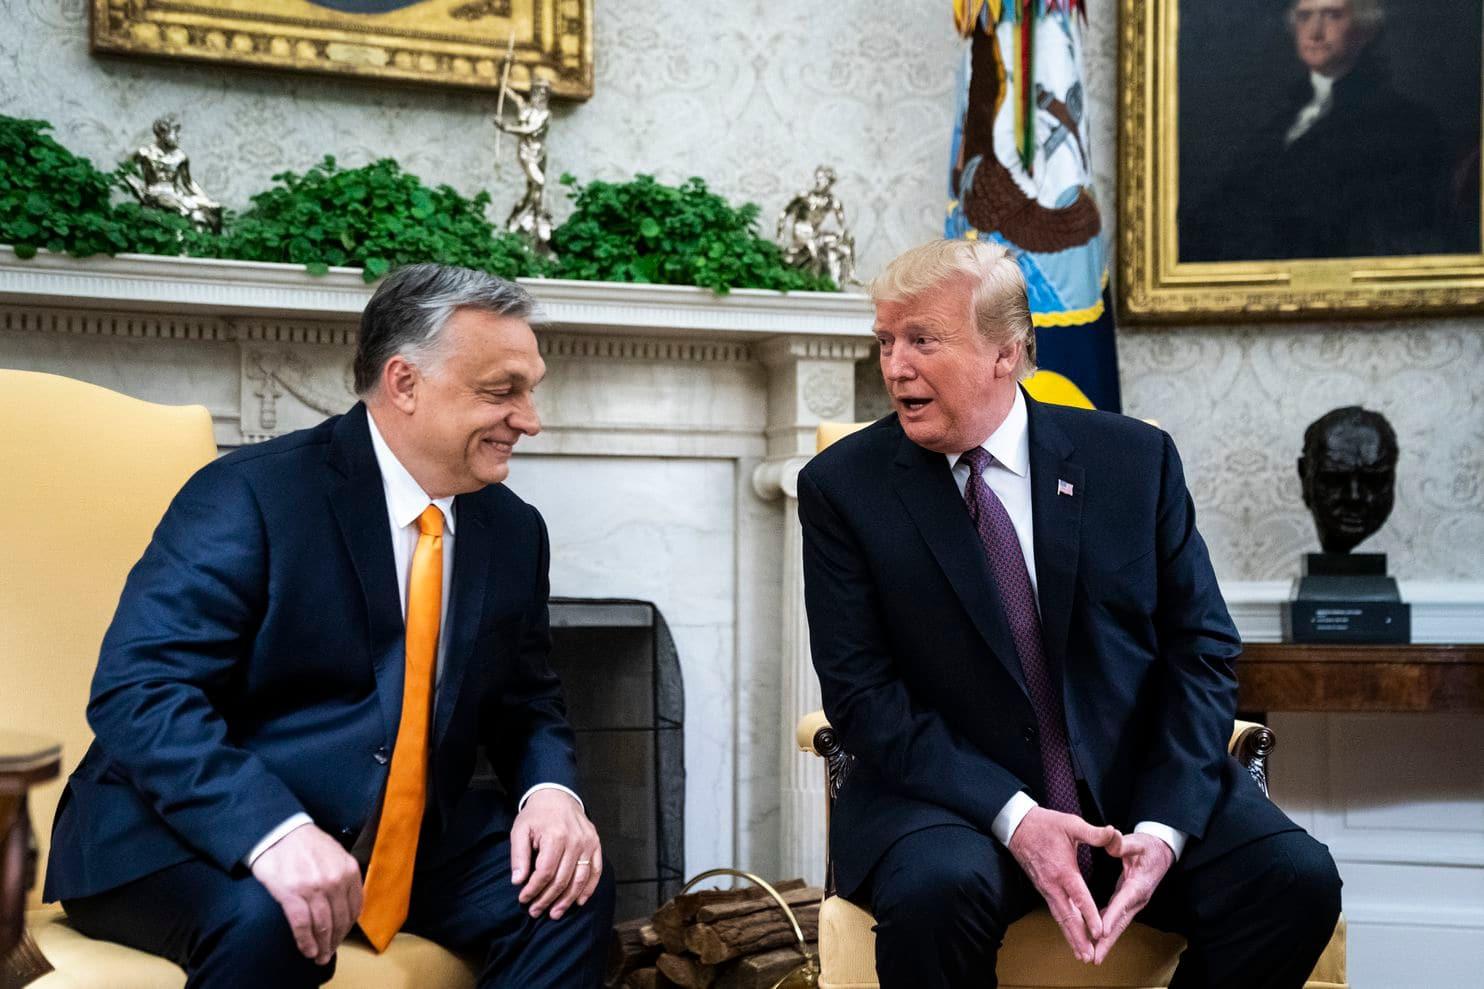 Putin and Hungary's Orban helped sour Trump on Ukraine